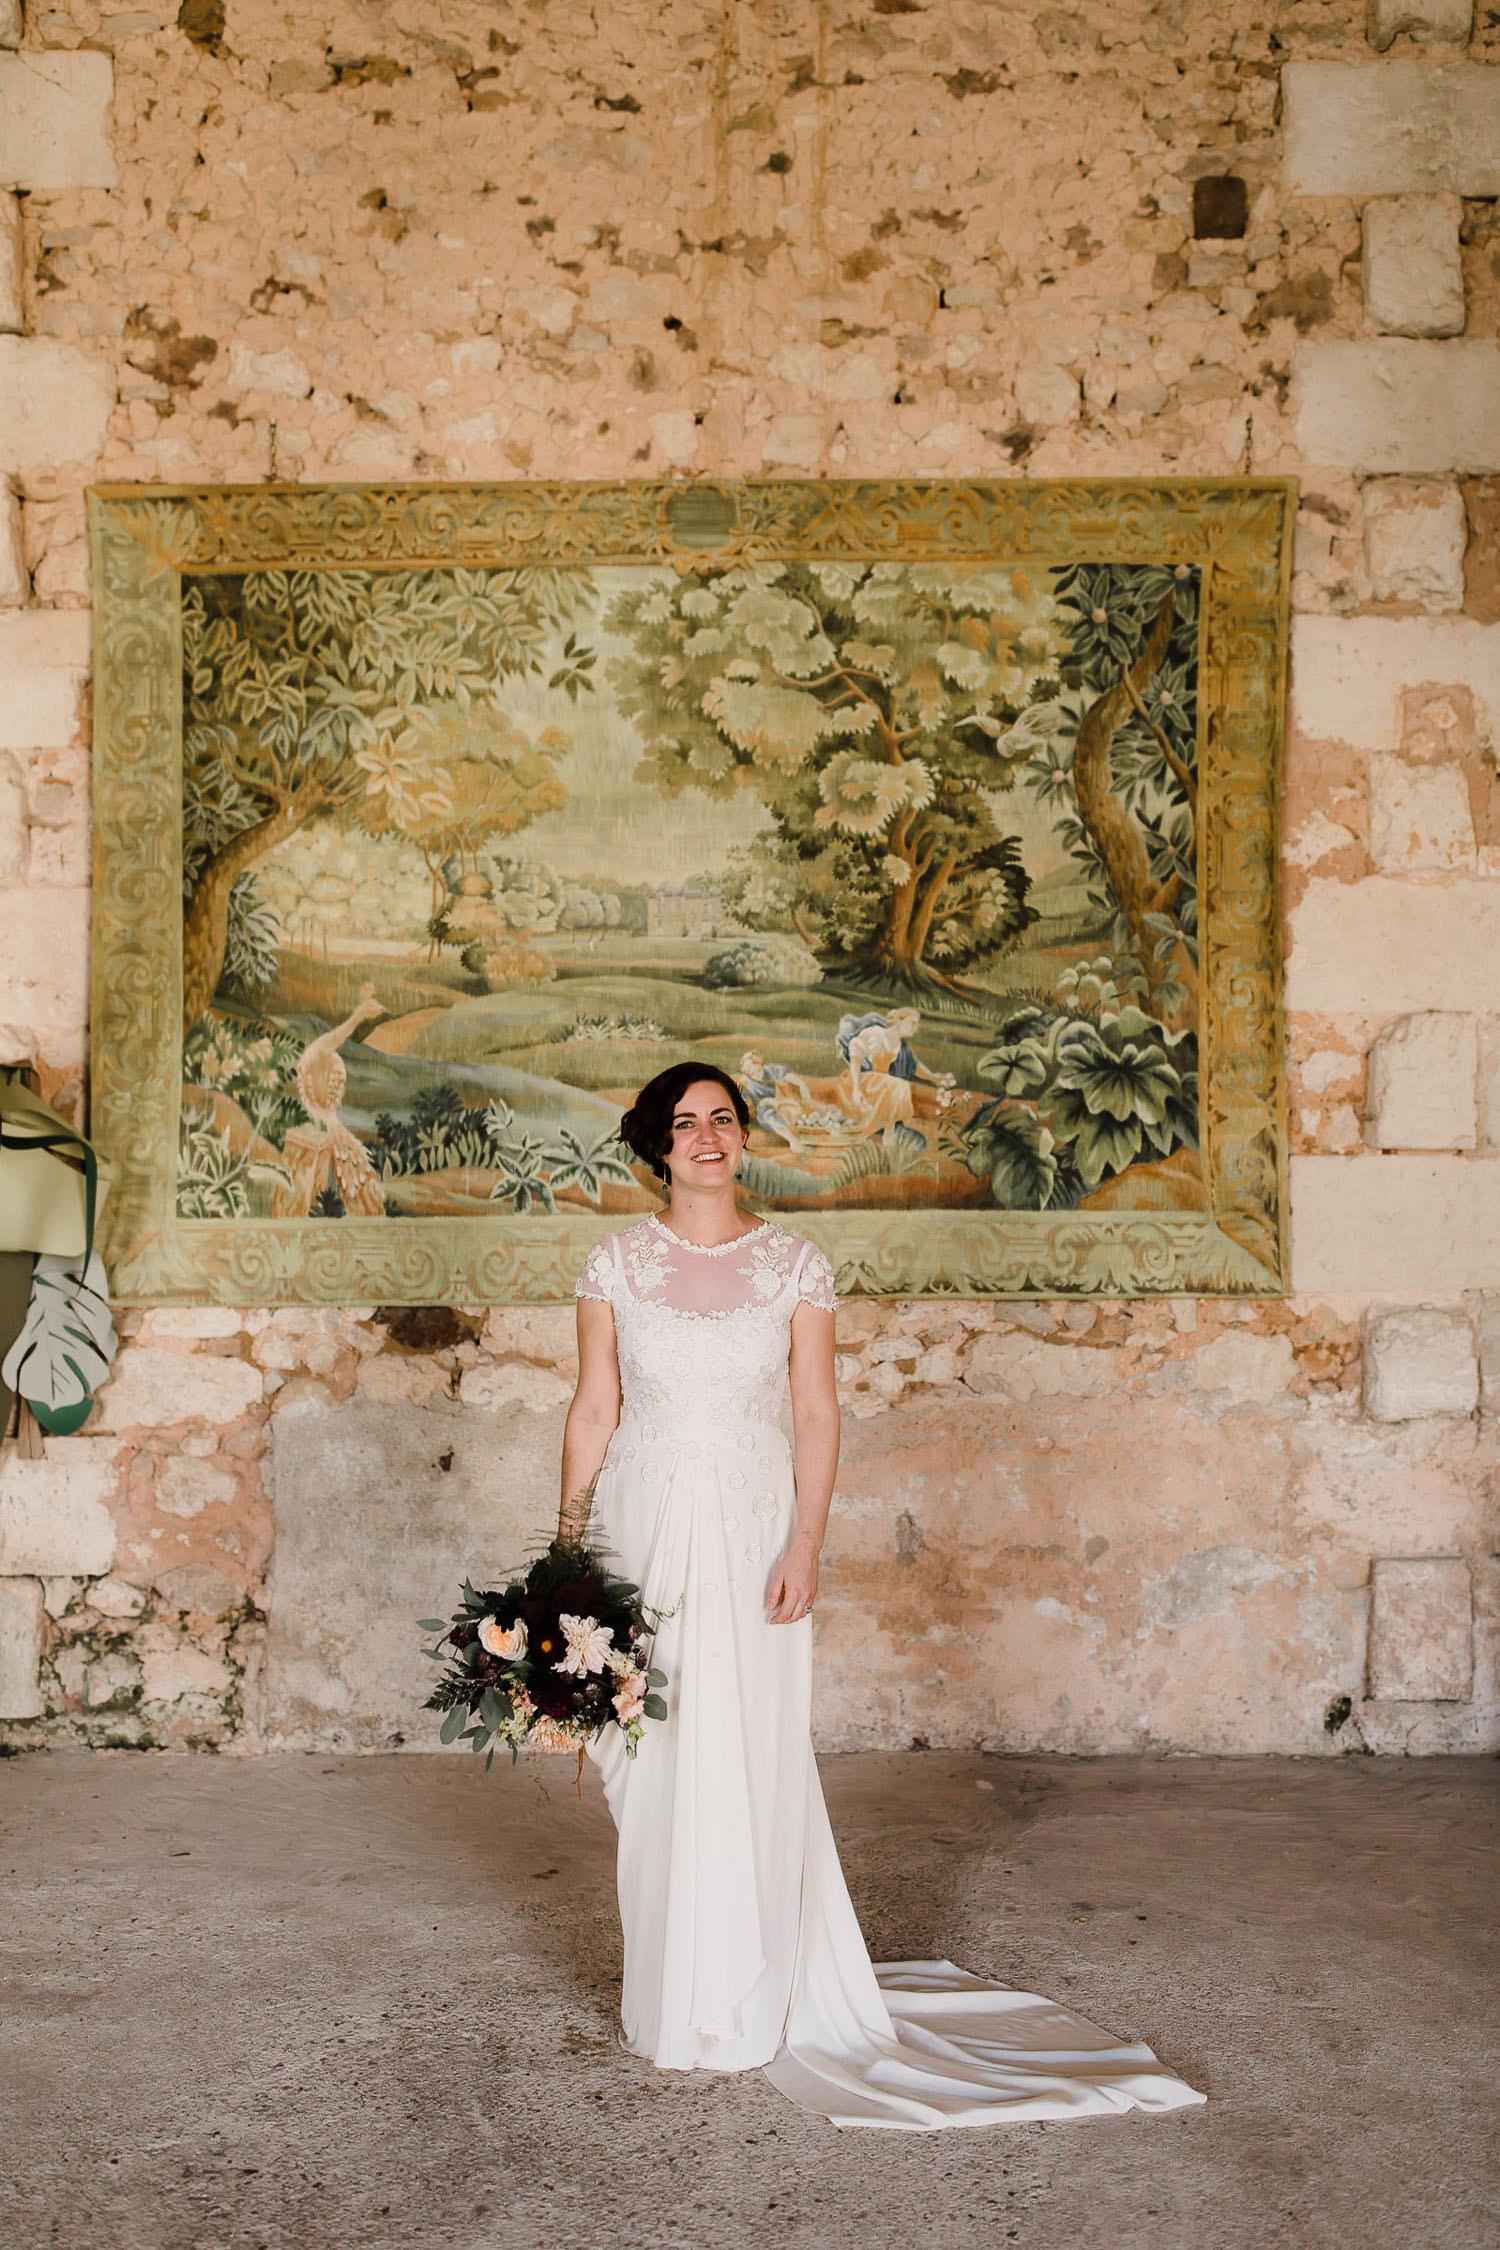 France-Destination-Wedding-Chateau-la-Blérétie-Best-Of-Holly-Jack-91.jpg